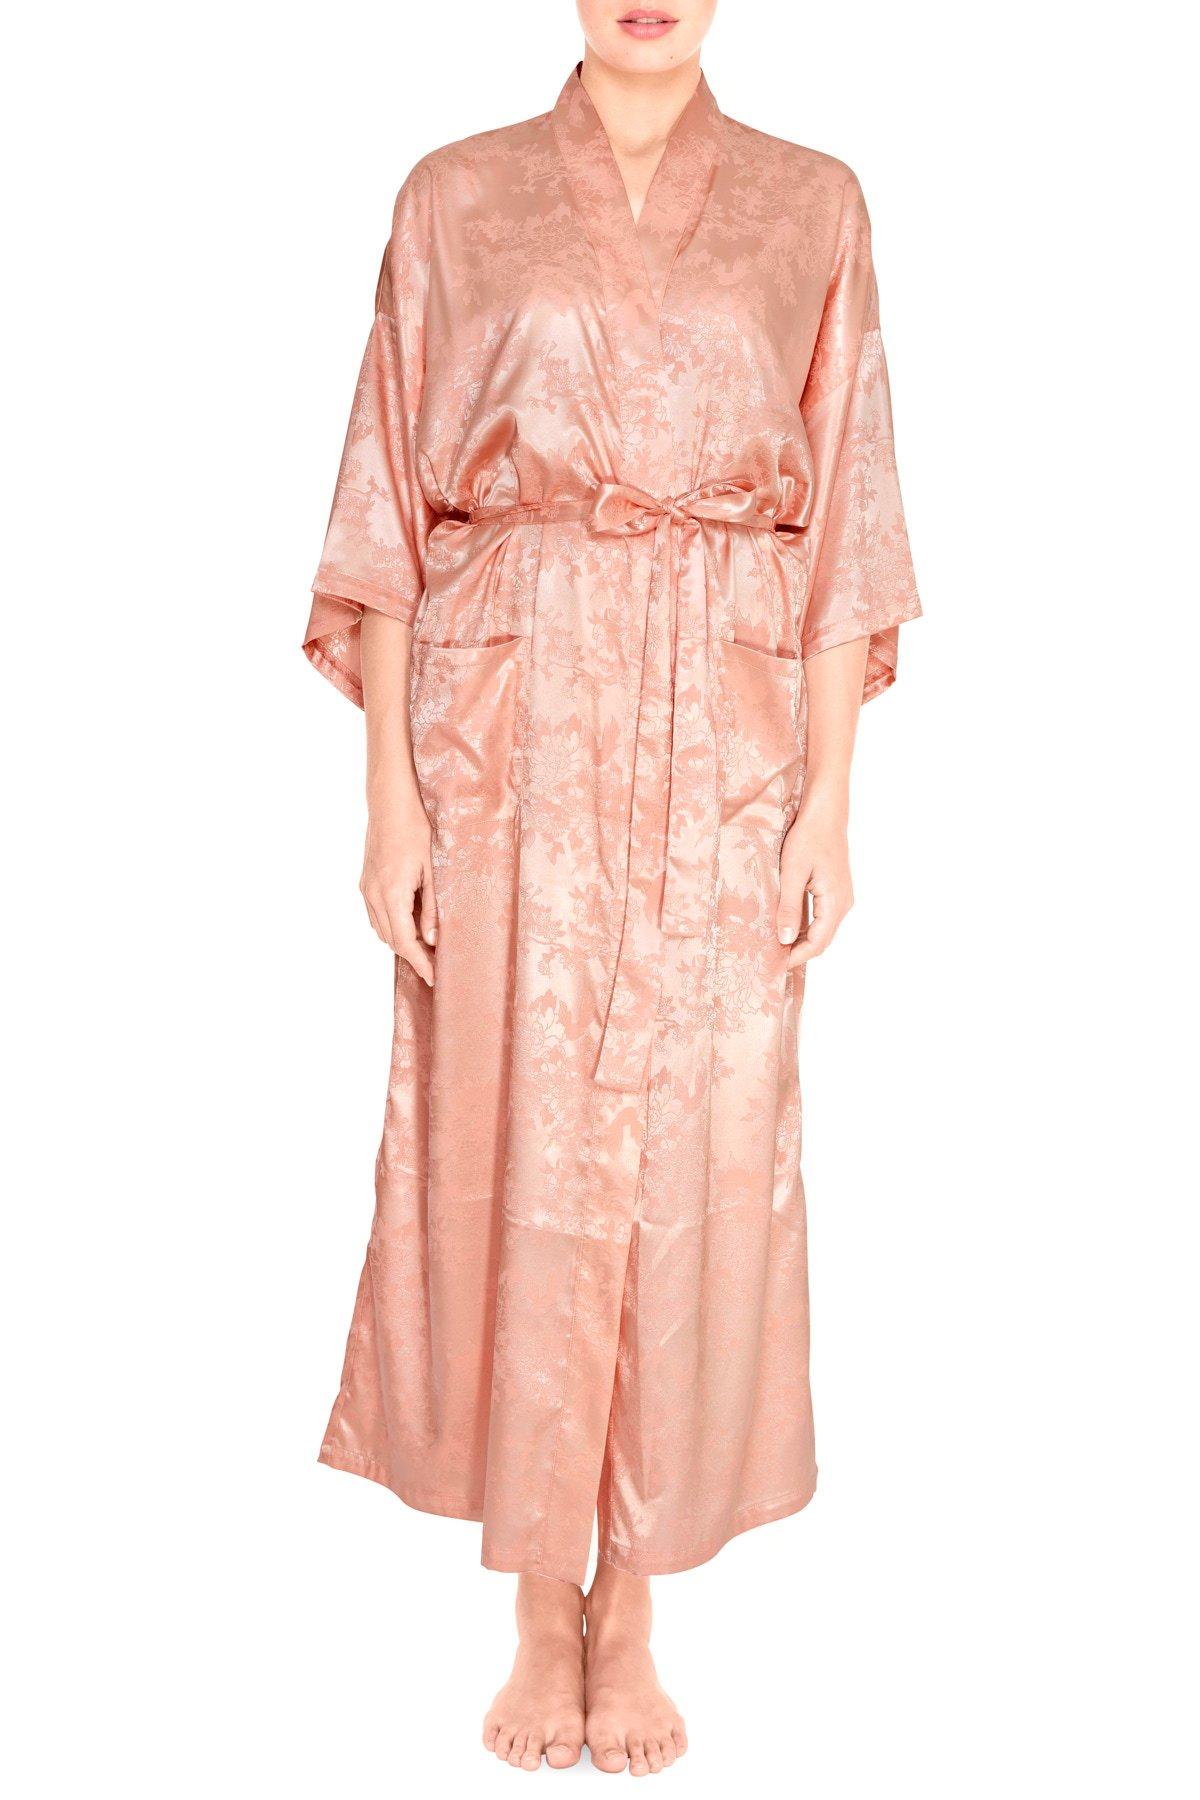 Lang lyserød satin kimono I Køb kimonoer hos Viola Sky